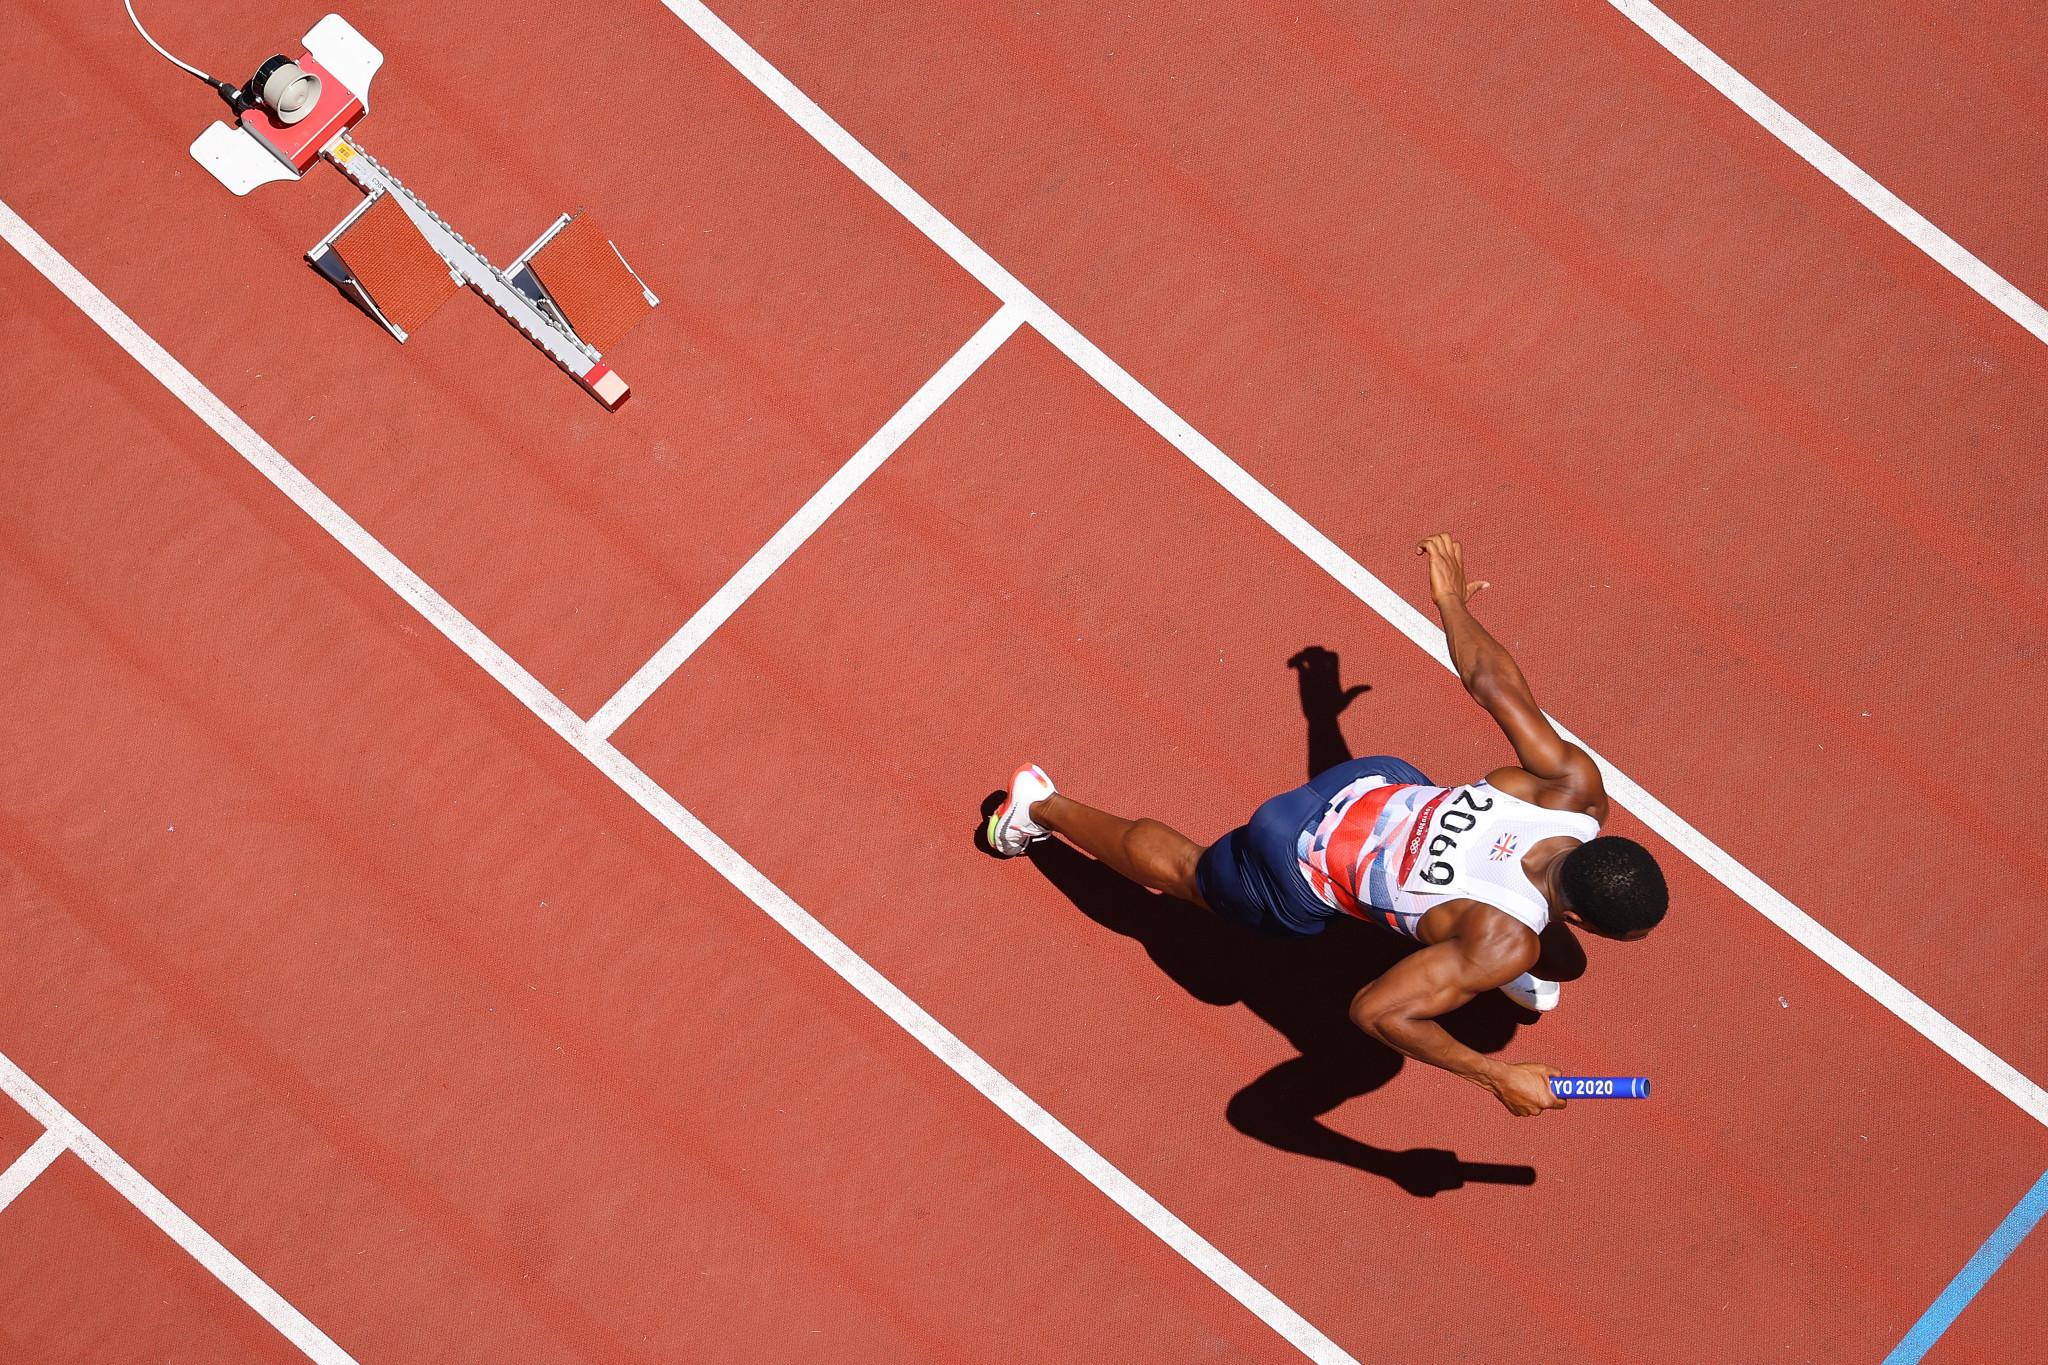 UK Athletics chief executive Coates and performance director Symington leave organisation